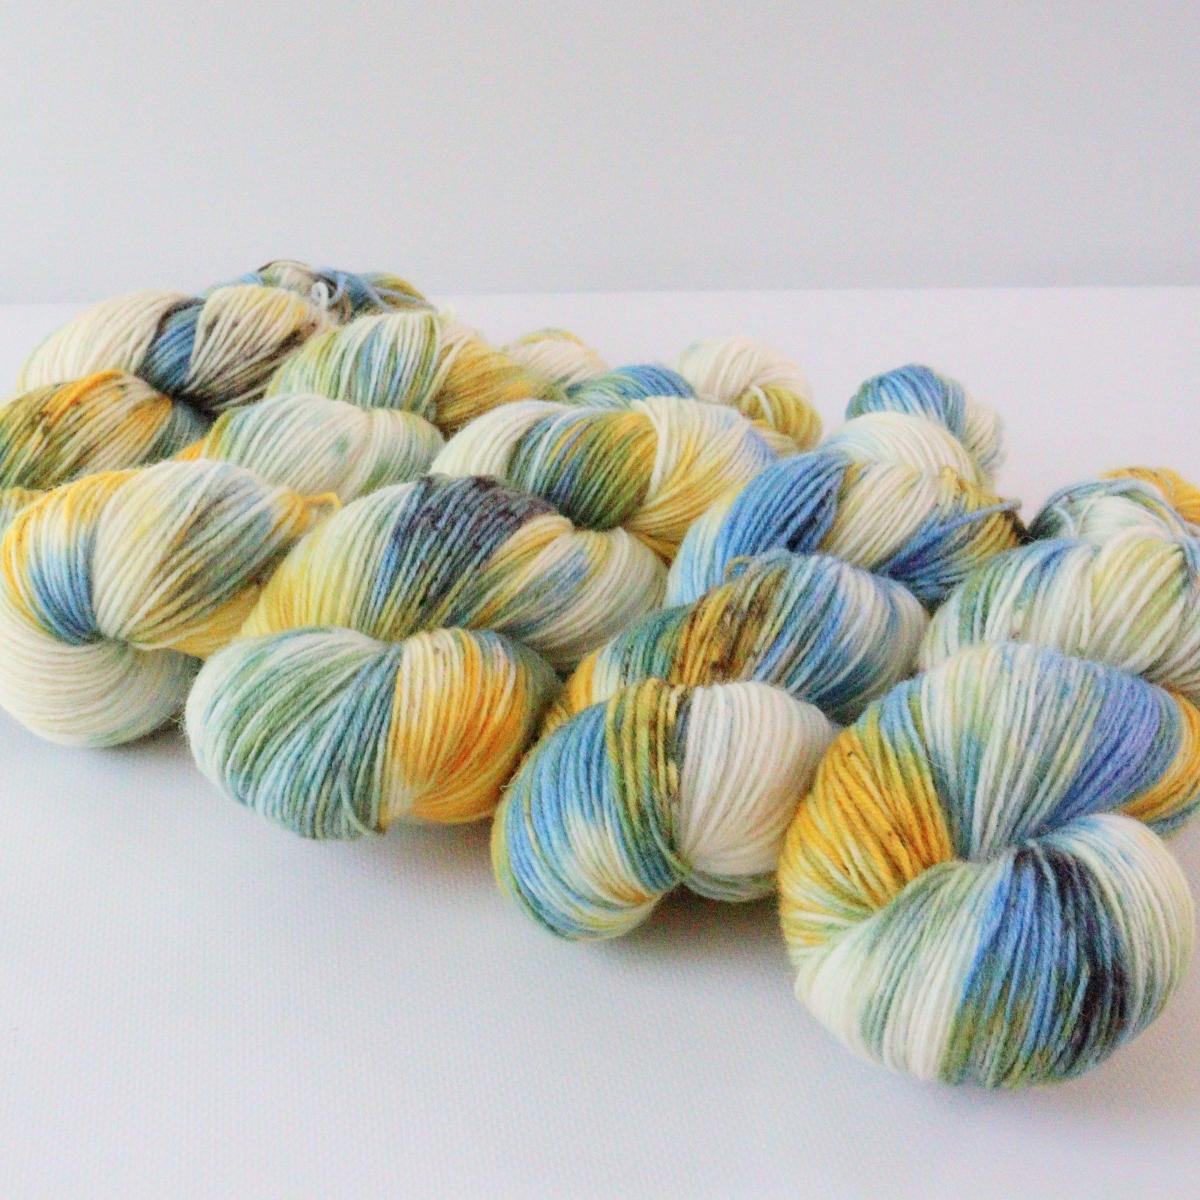 woodico.pro hand dyed yarn 087 5 1200x1200 - Hand dyed yarn / 087